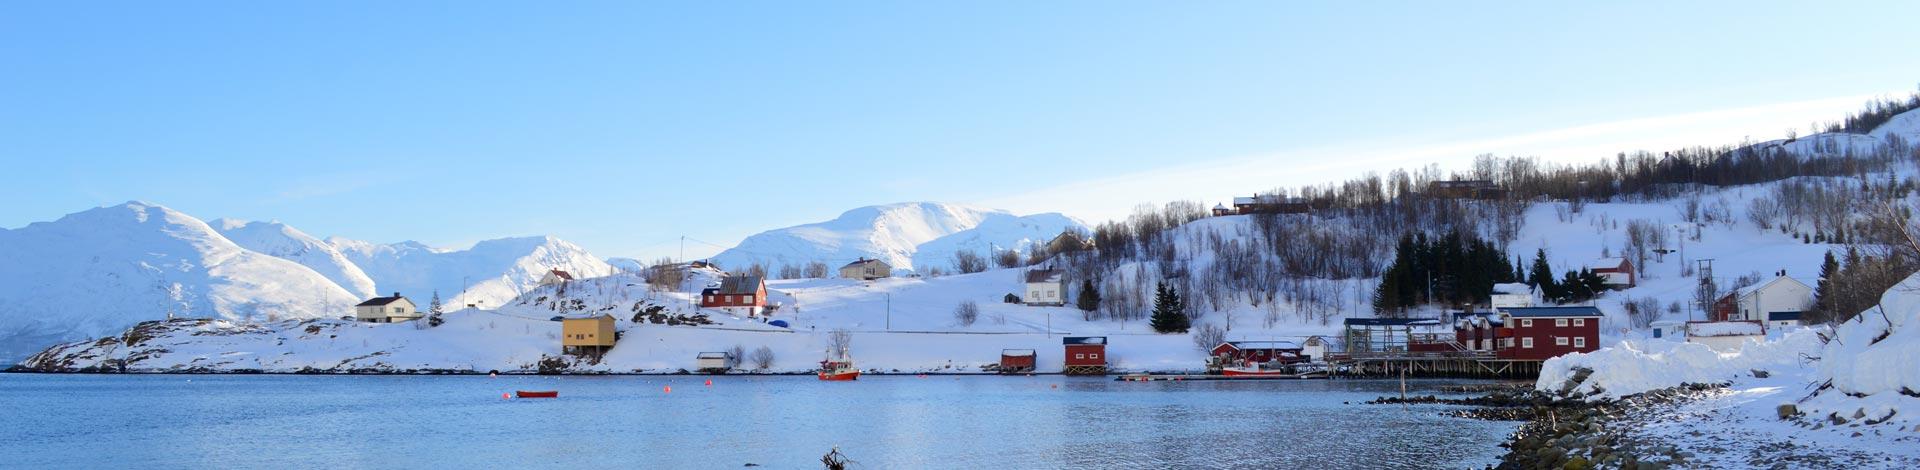 bergfuehrer-stephan-ruoss-skitouren-in-norwegen-lyngen-alpen